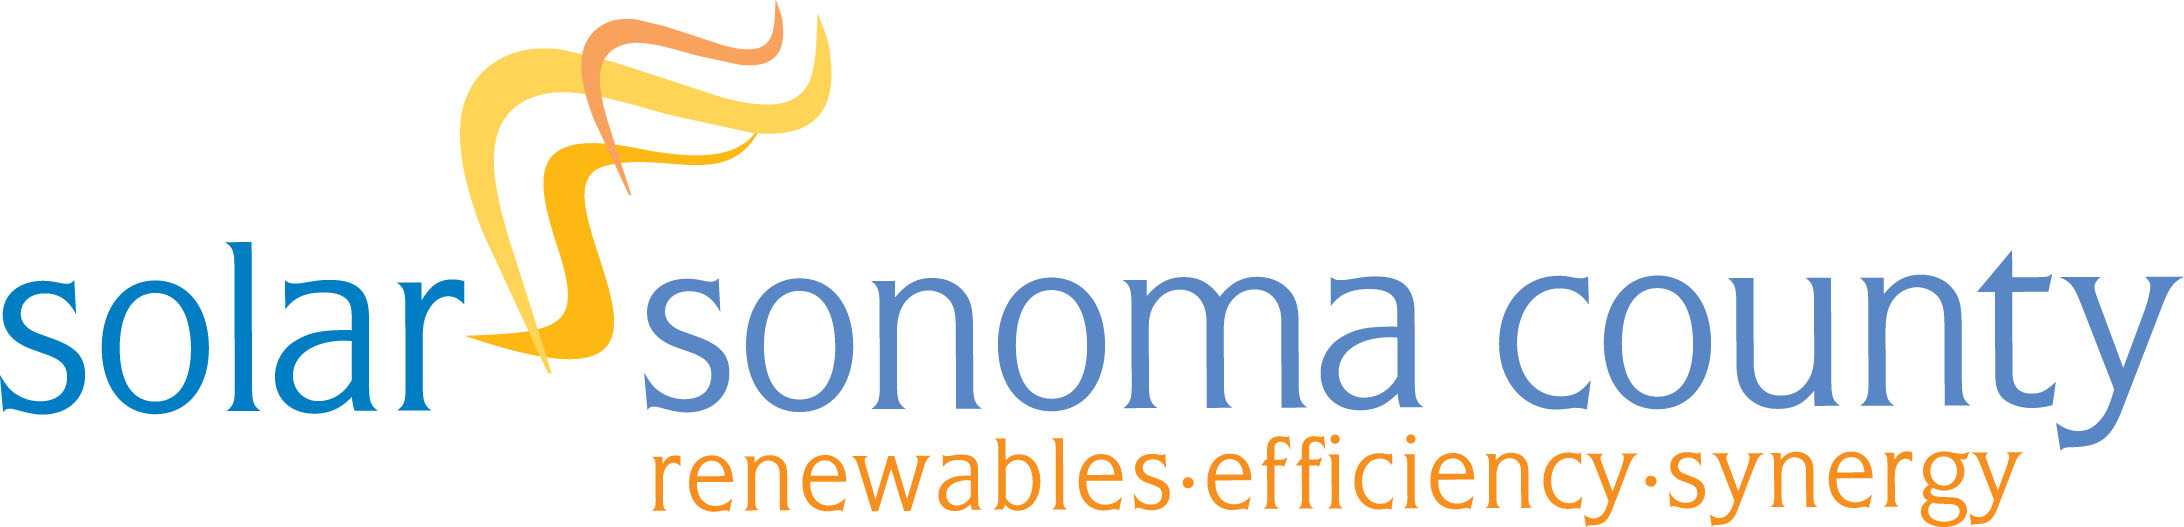 Solar Sonoma County logo